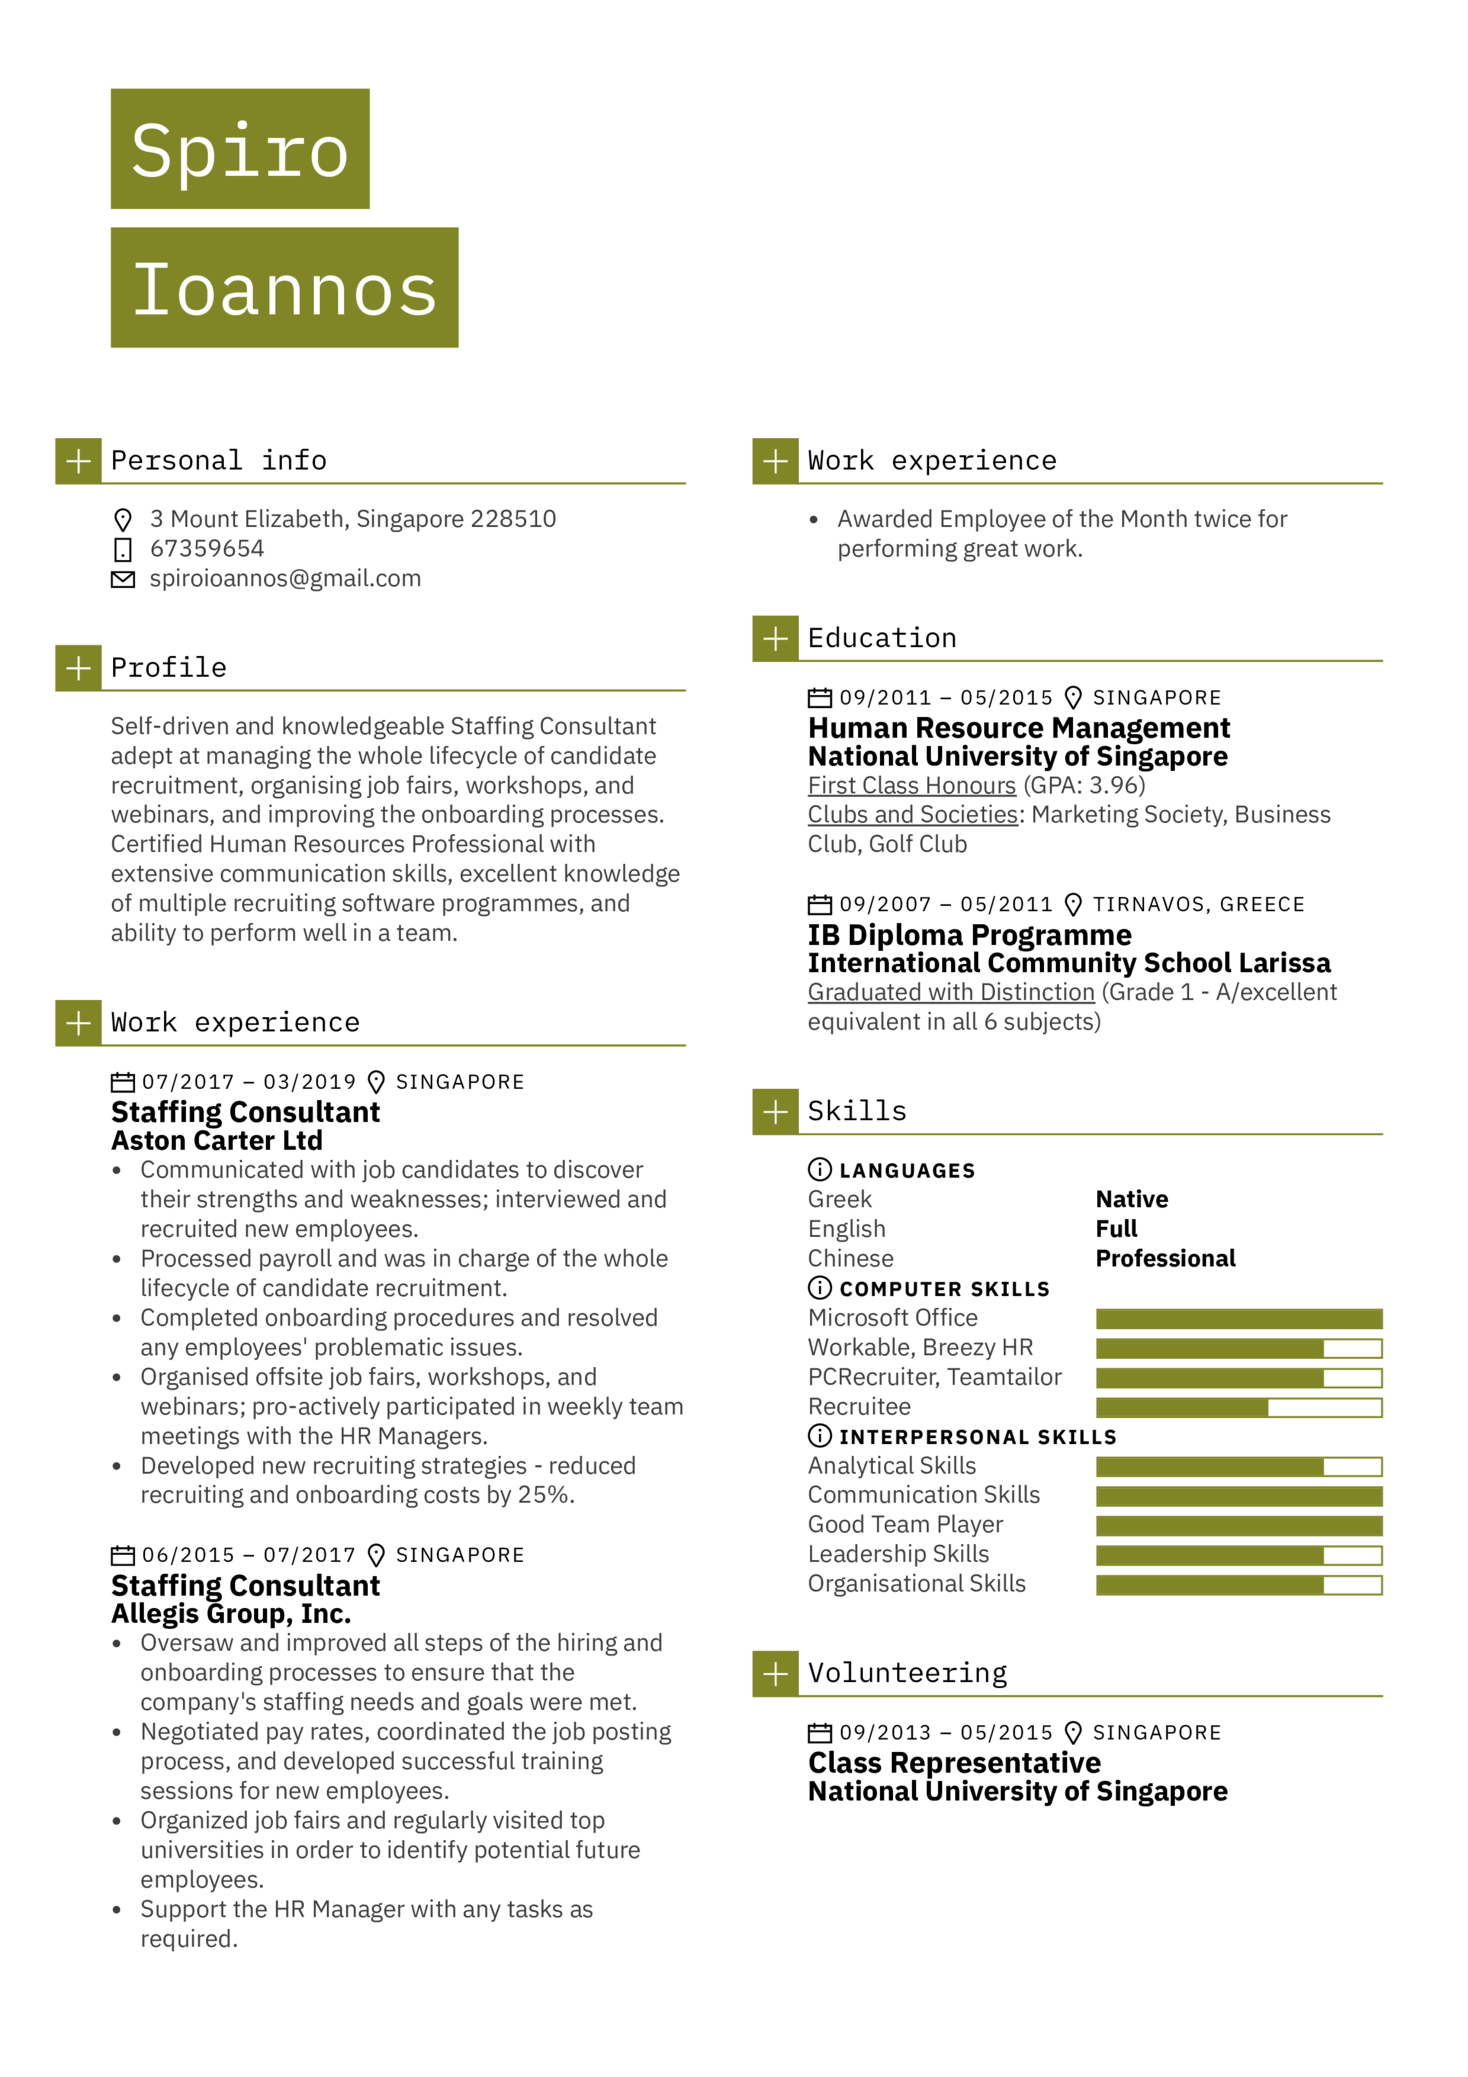 Staffing Consultant Resume Sample (časť 1)